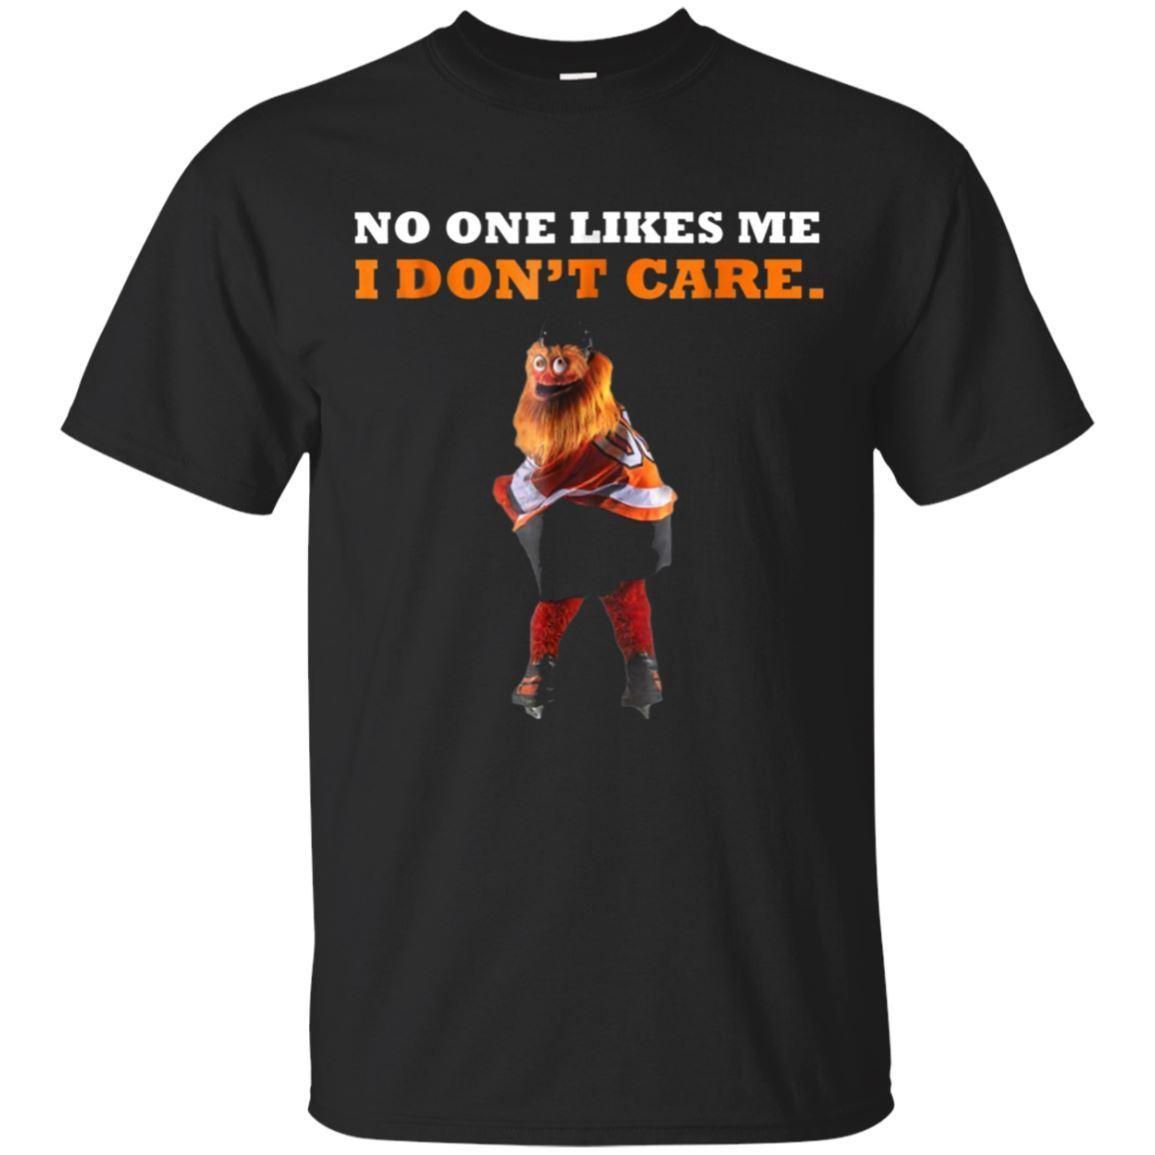 No a nadie le gusto I Dont Care Gritty Philly mascota negro camiseta tamaño de dibujos animados camiseta hombres Unisex nuevo la camiseta de la moda